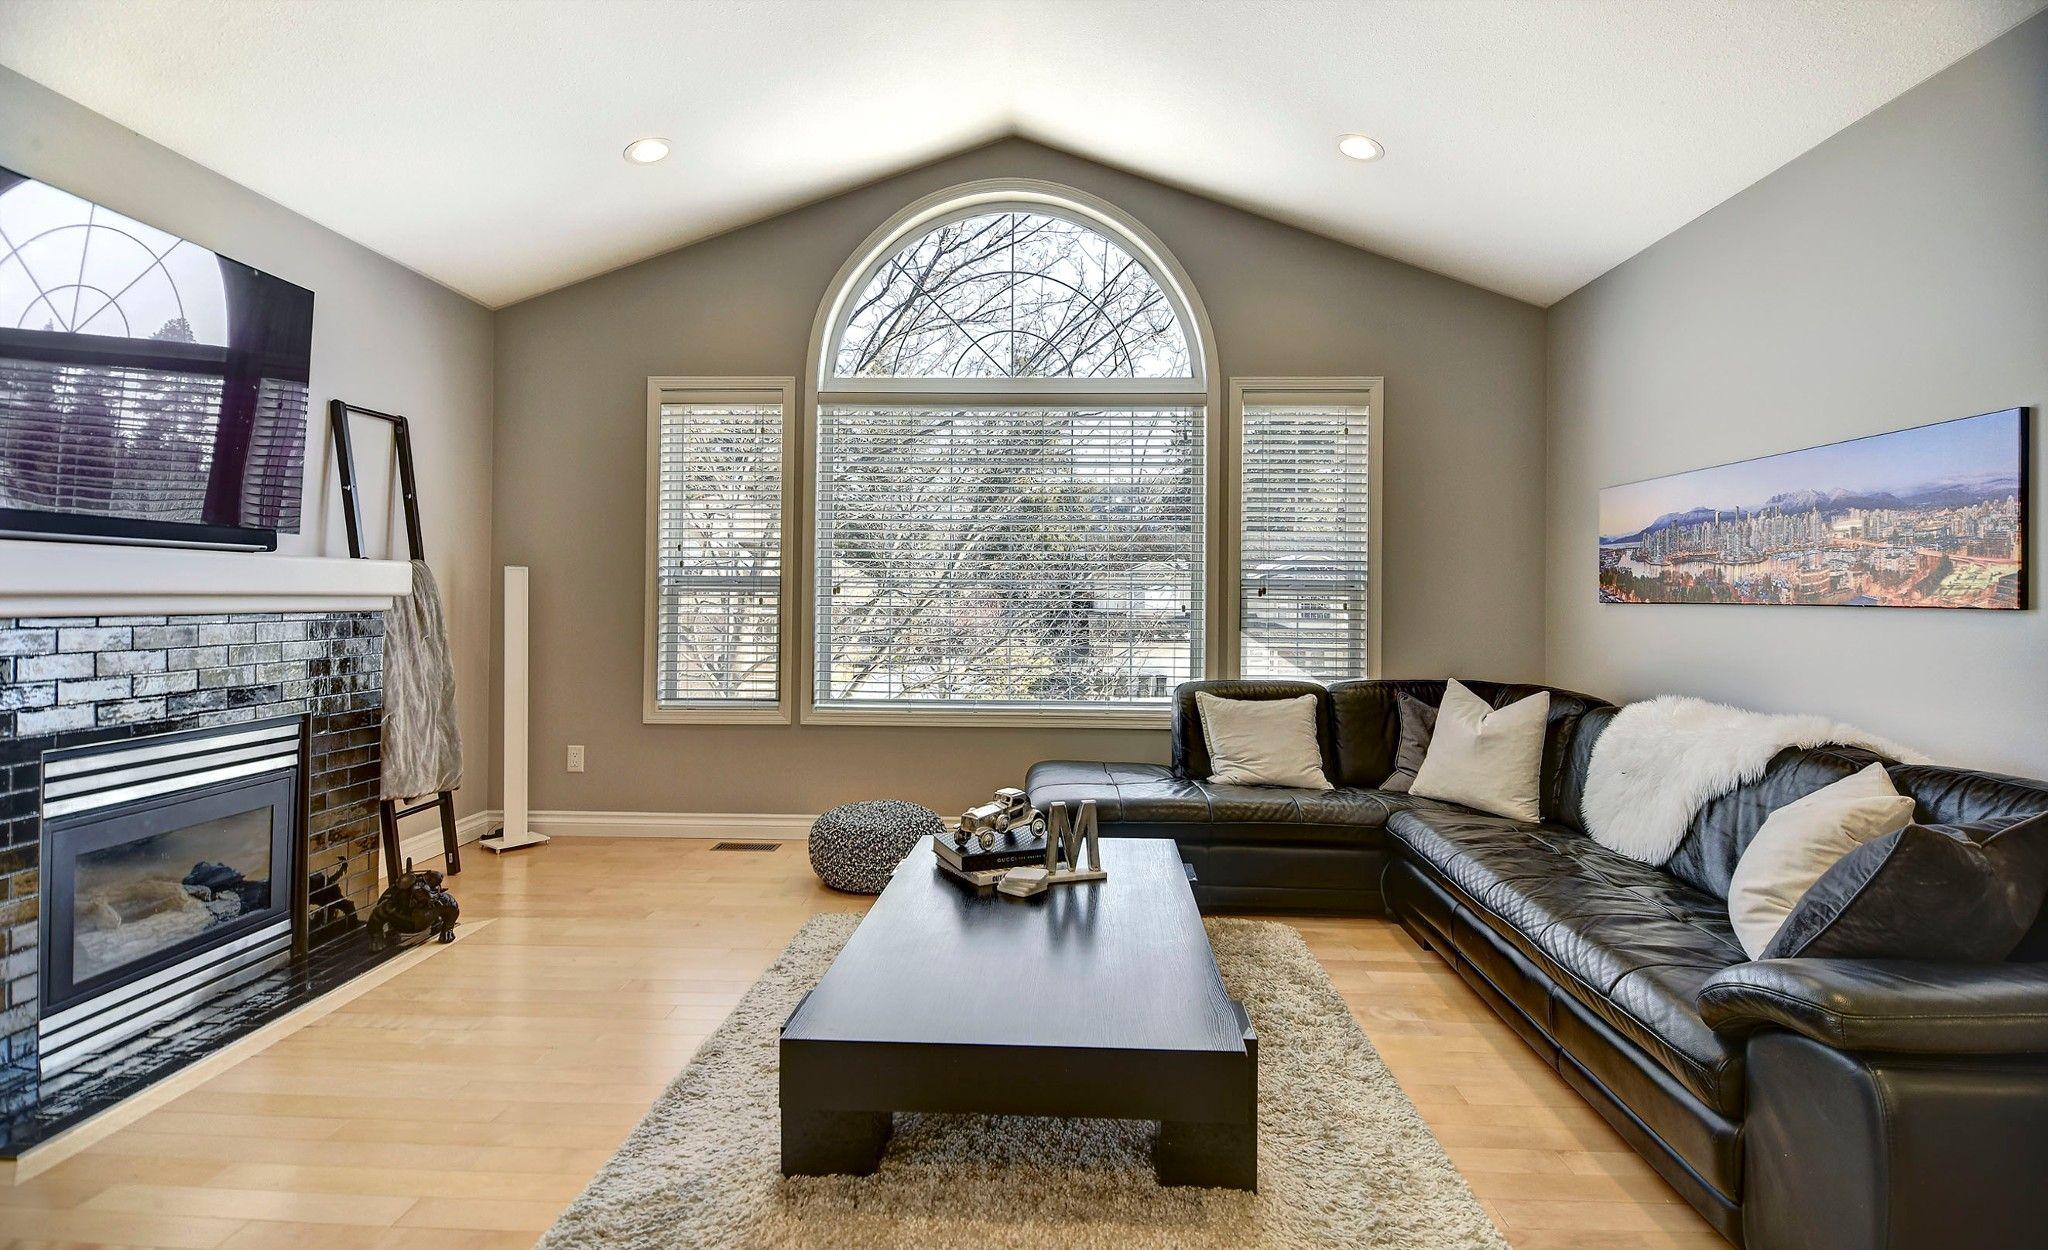 Photo 6: Photos: 270 Magic Drive in Kelowna: House for sale : MLS®# 10200191